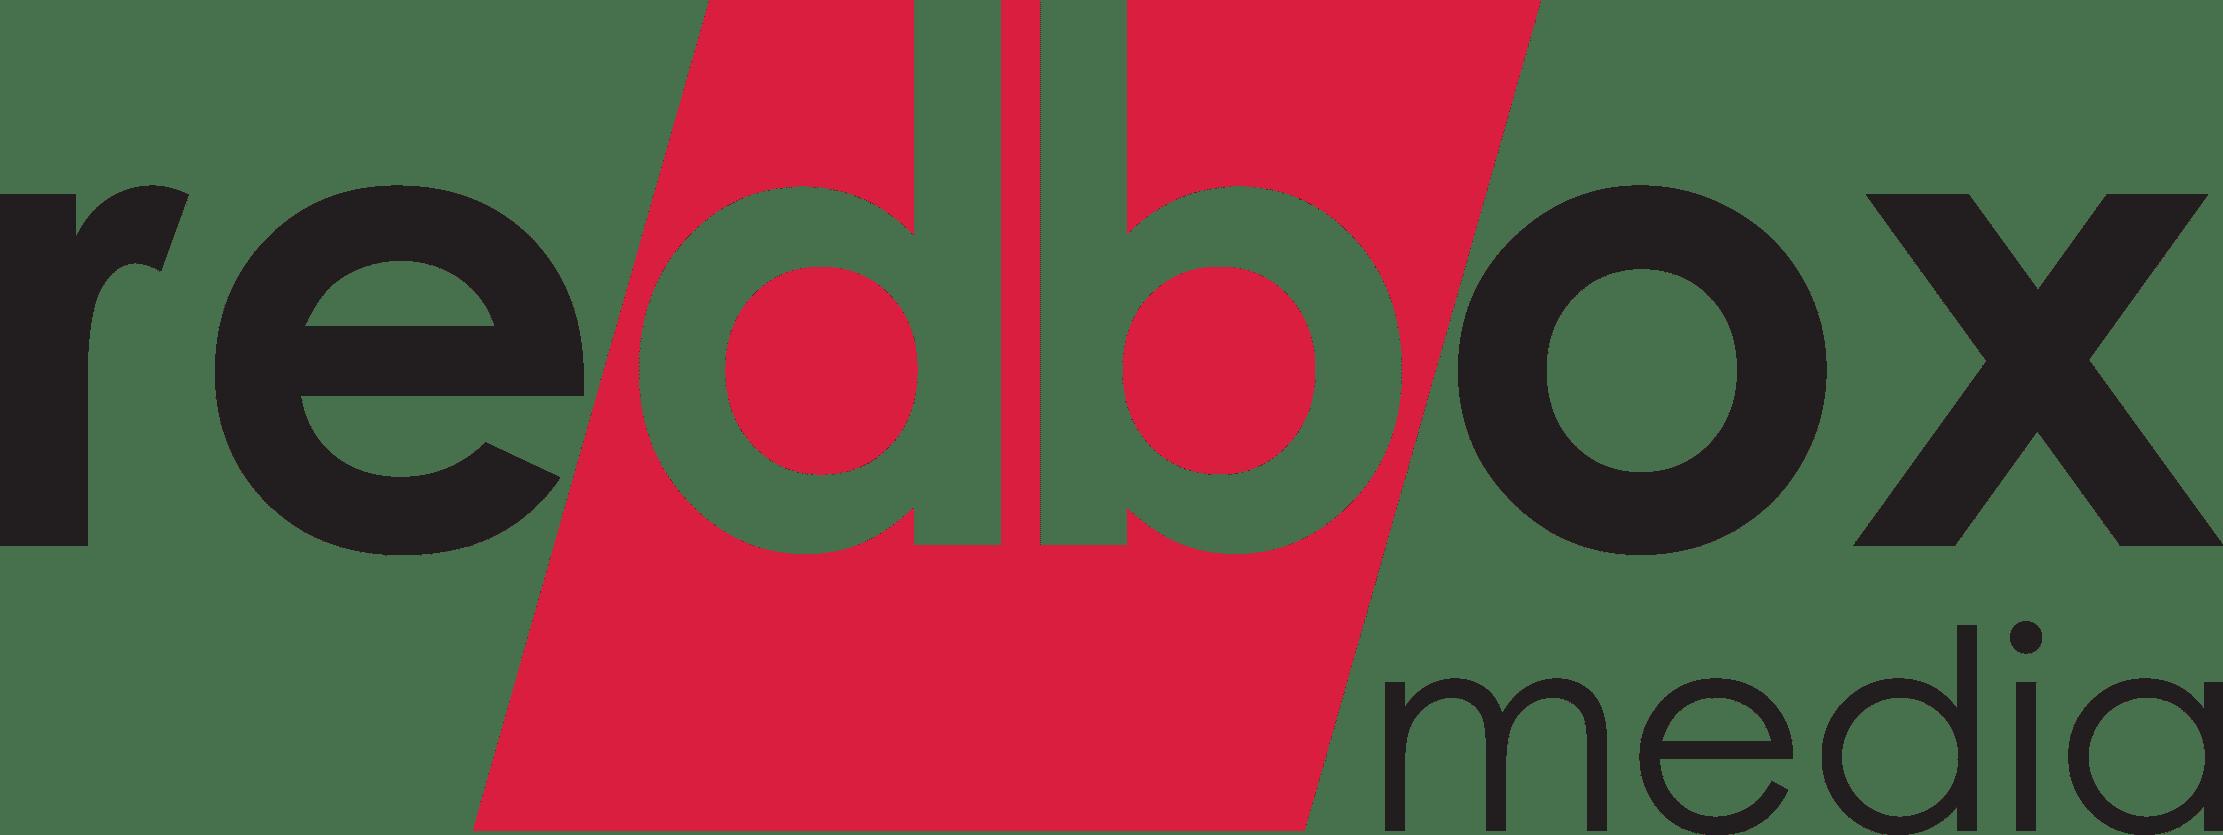 HD Redbox Media.